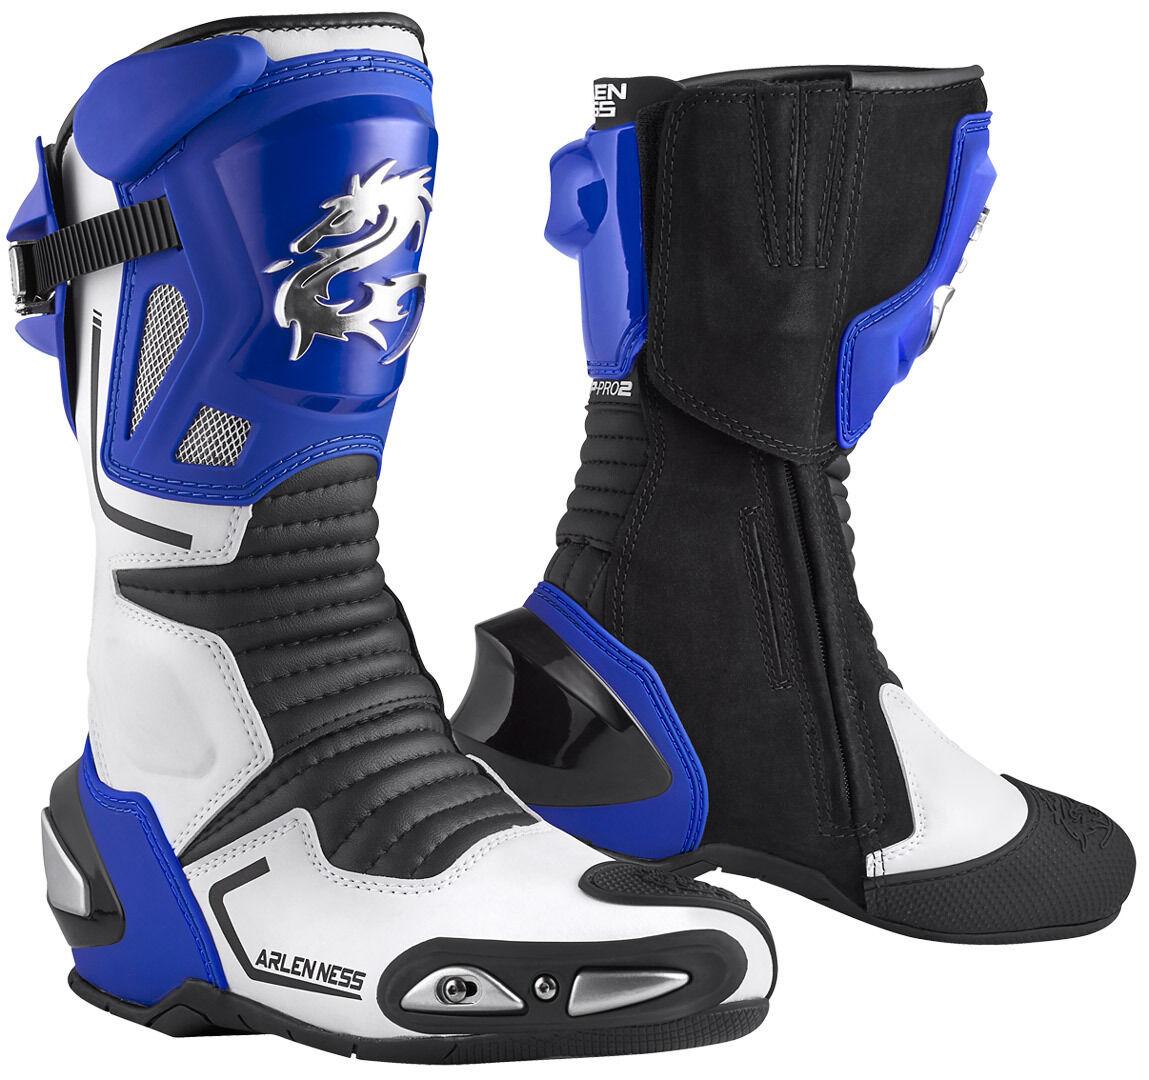 Arlen Ness Sugello Bottes de moto Noir Blanc Bleu taille : 47